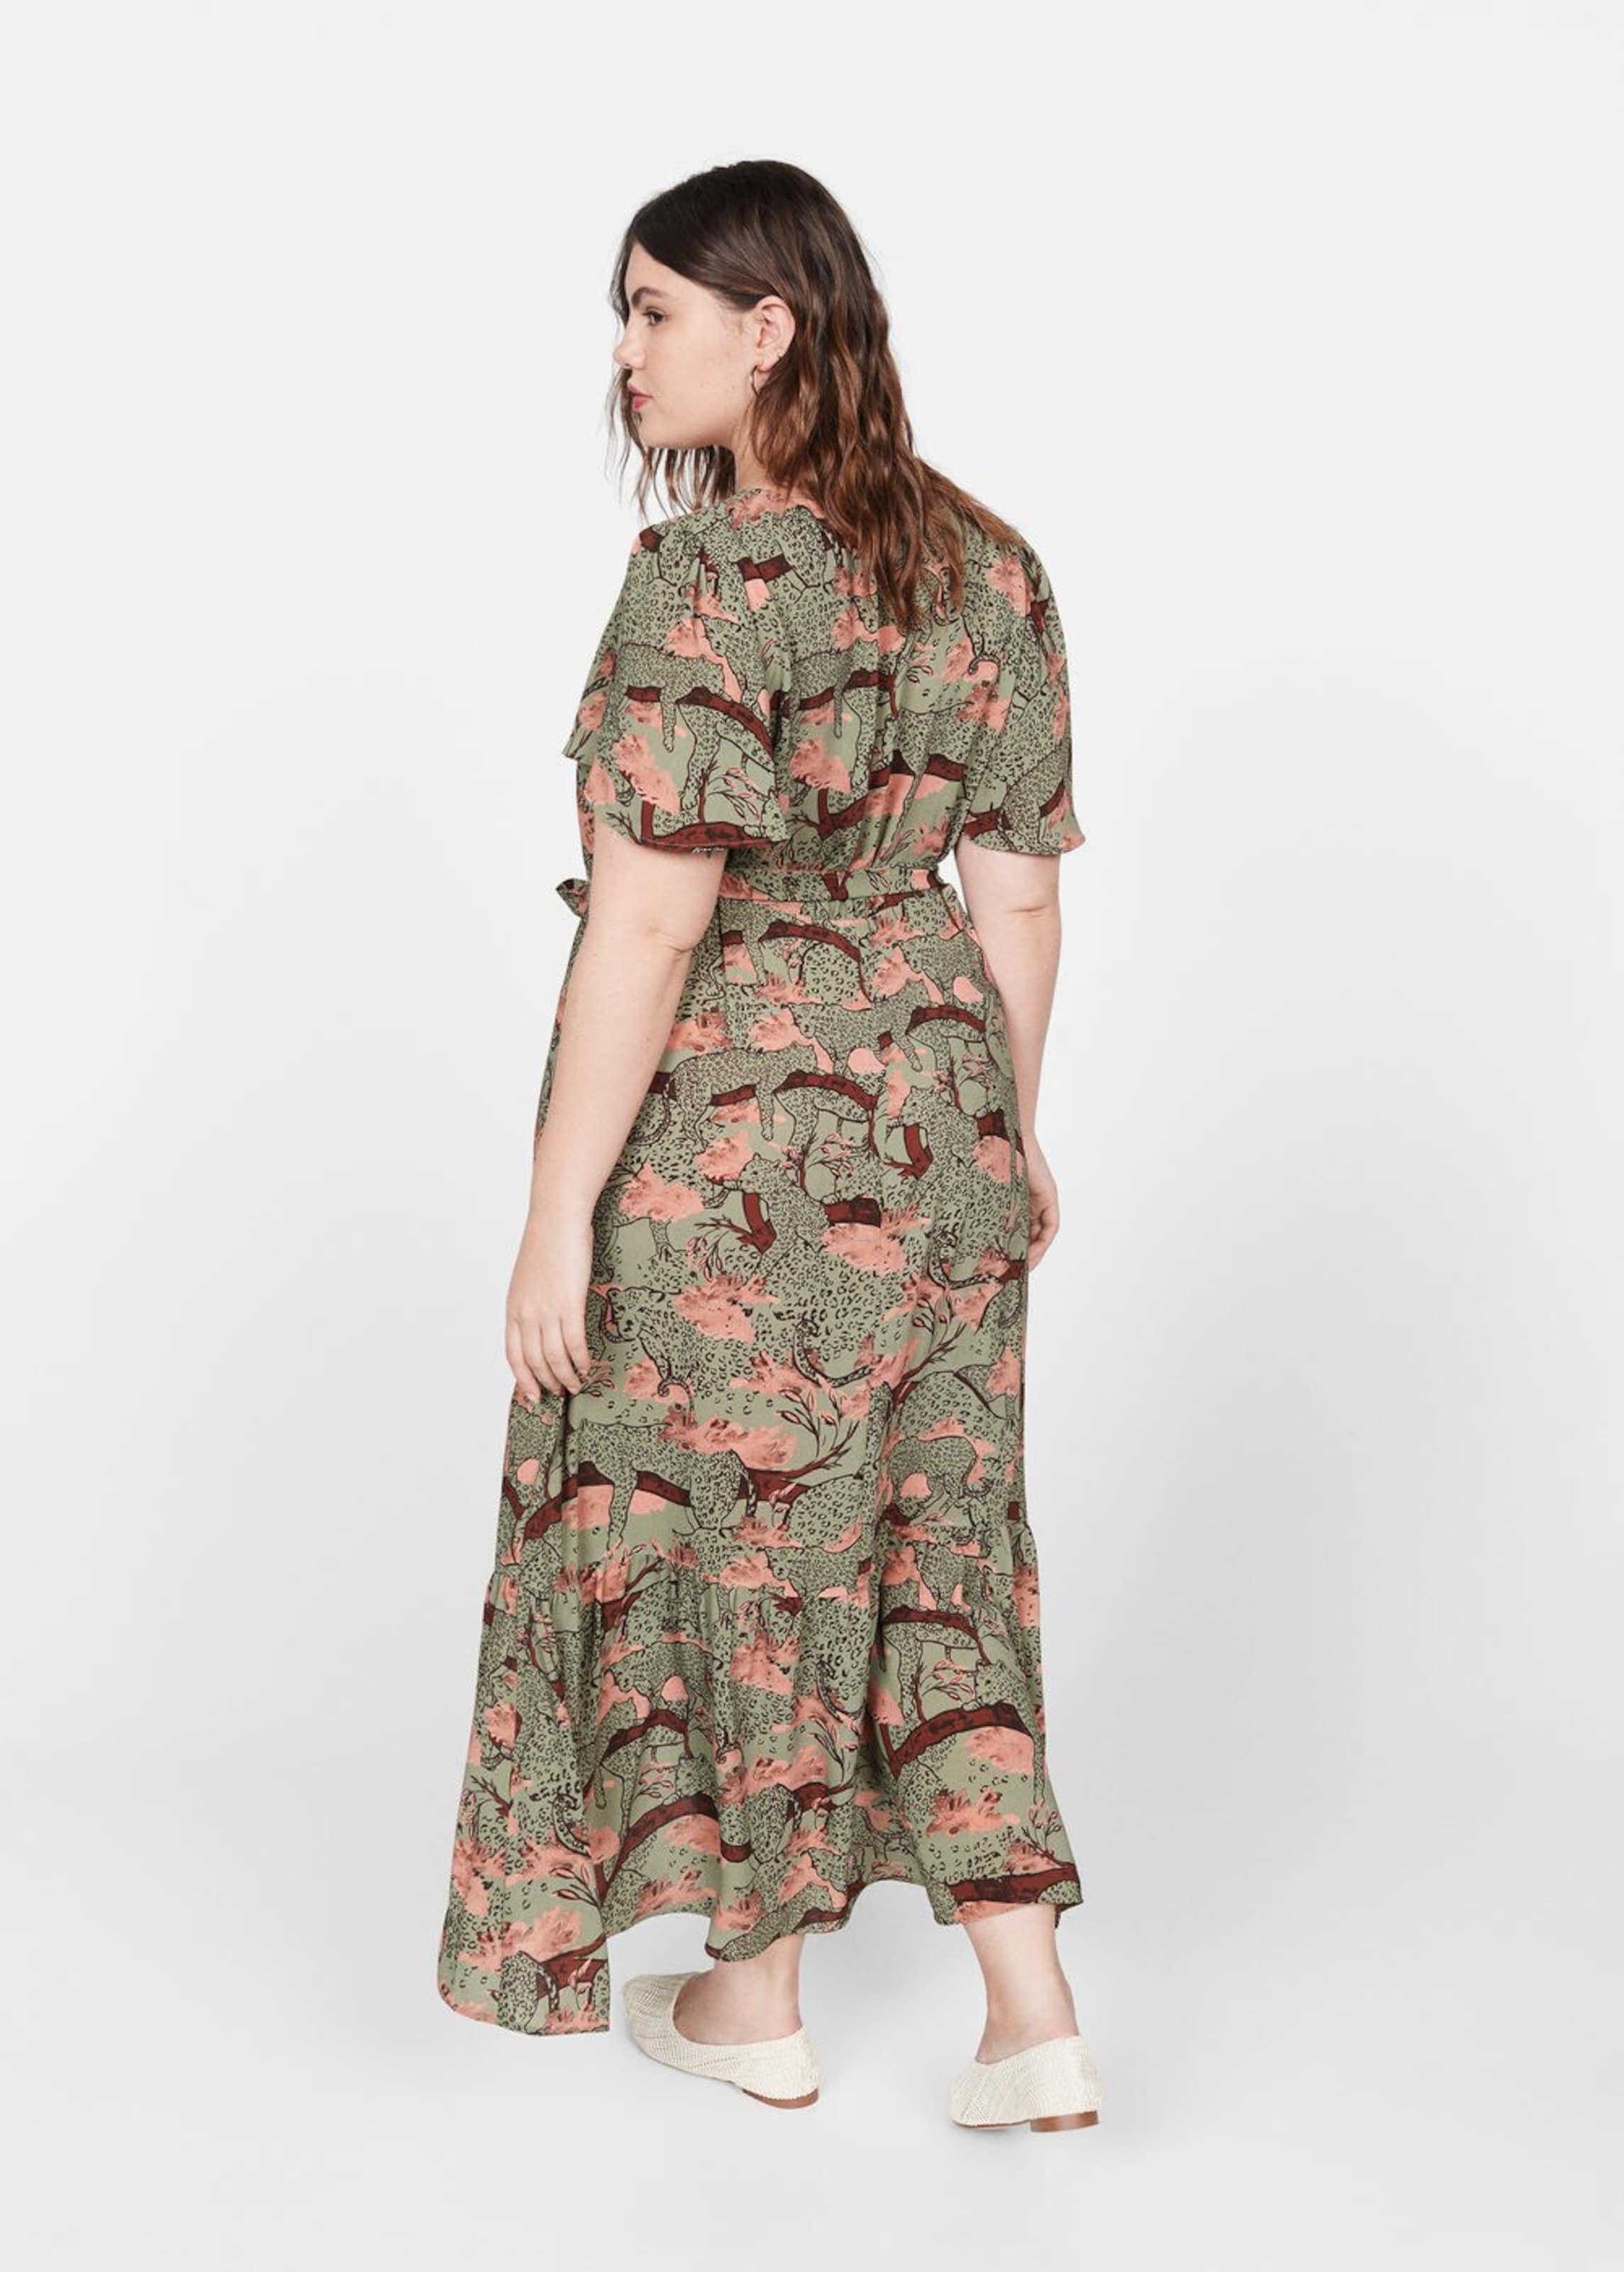 Violeta Kleid In Mango 'joana' By KhakiMischfarben xeWoErCBQd